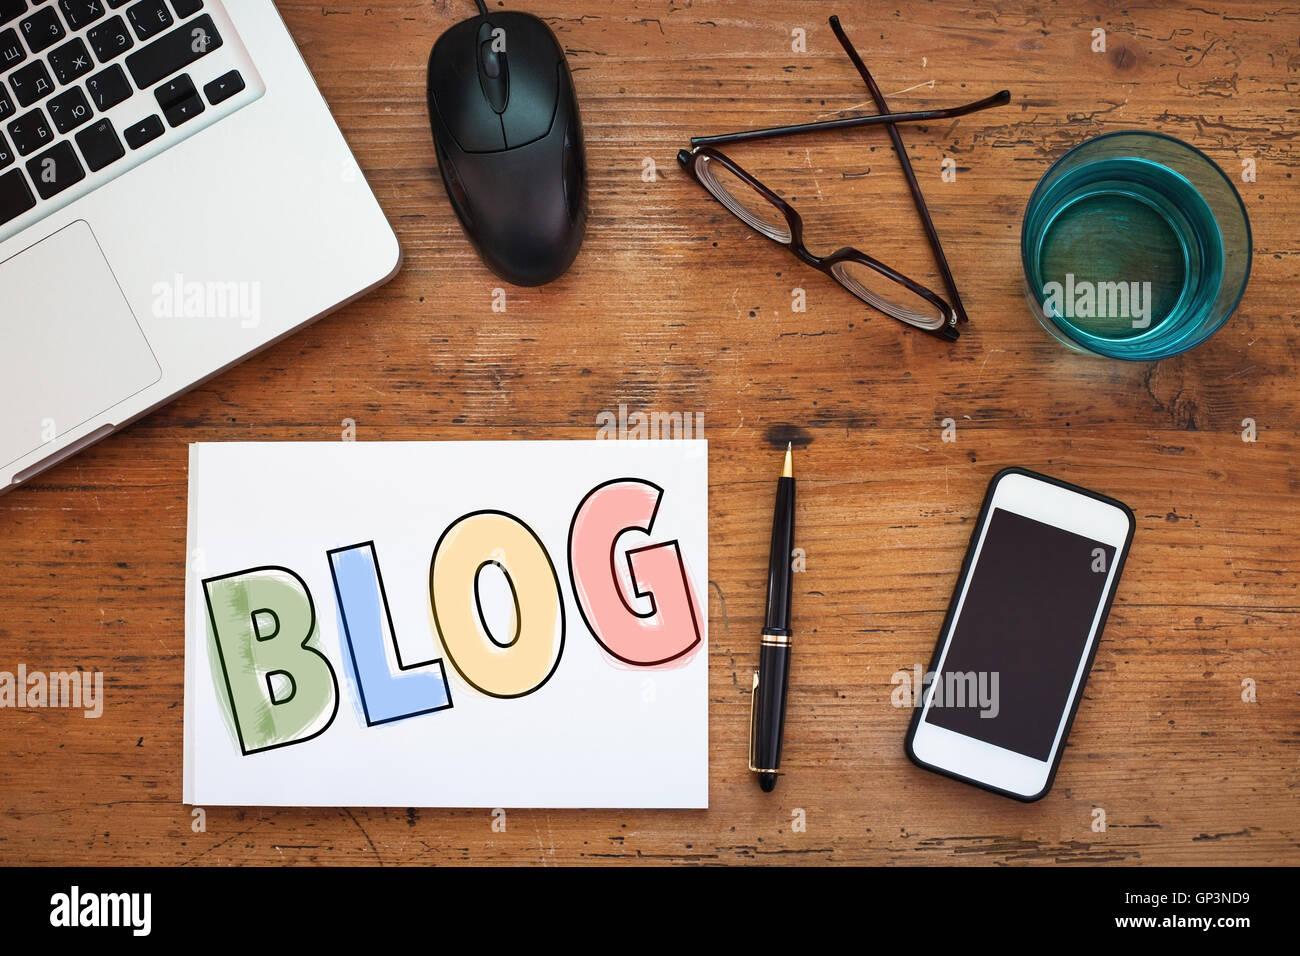 blog - Stock Image